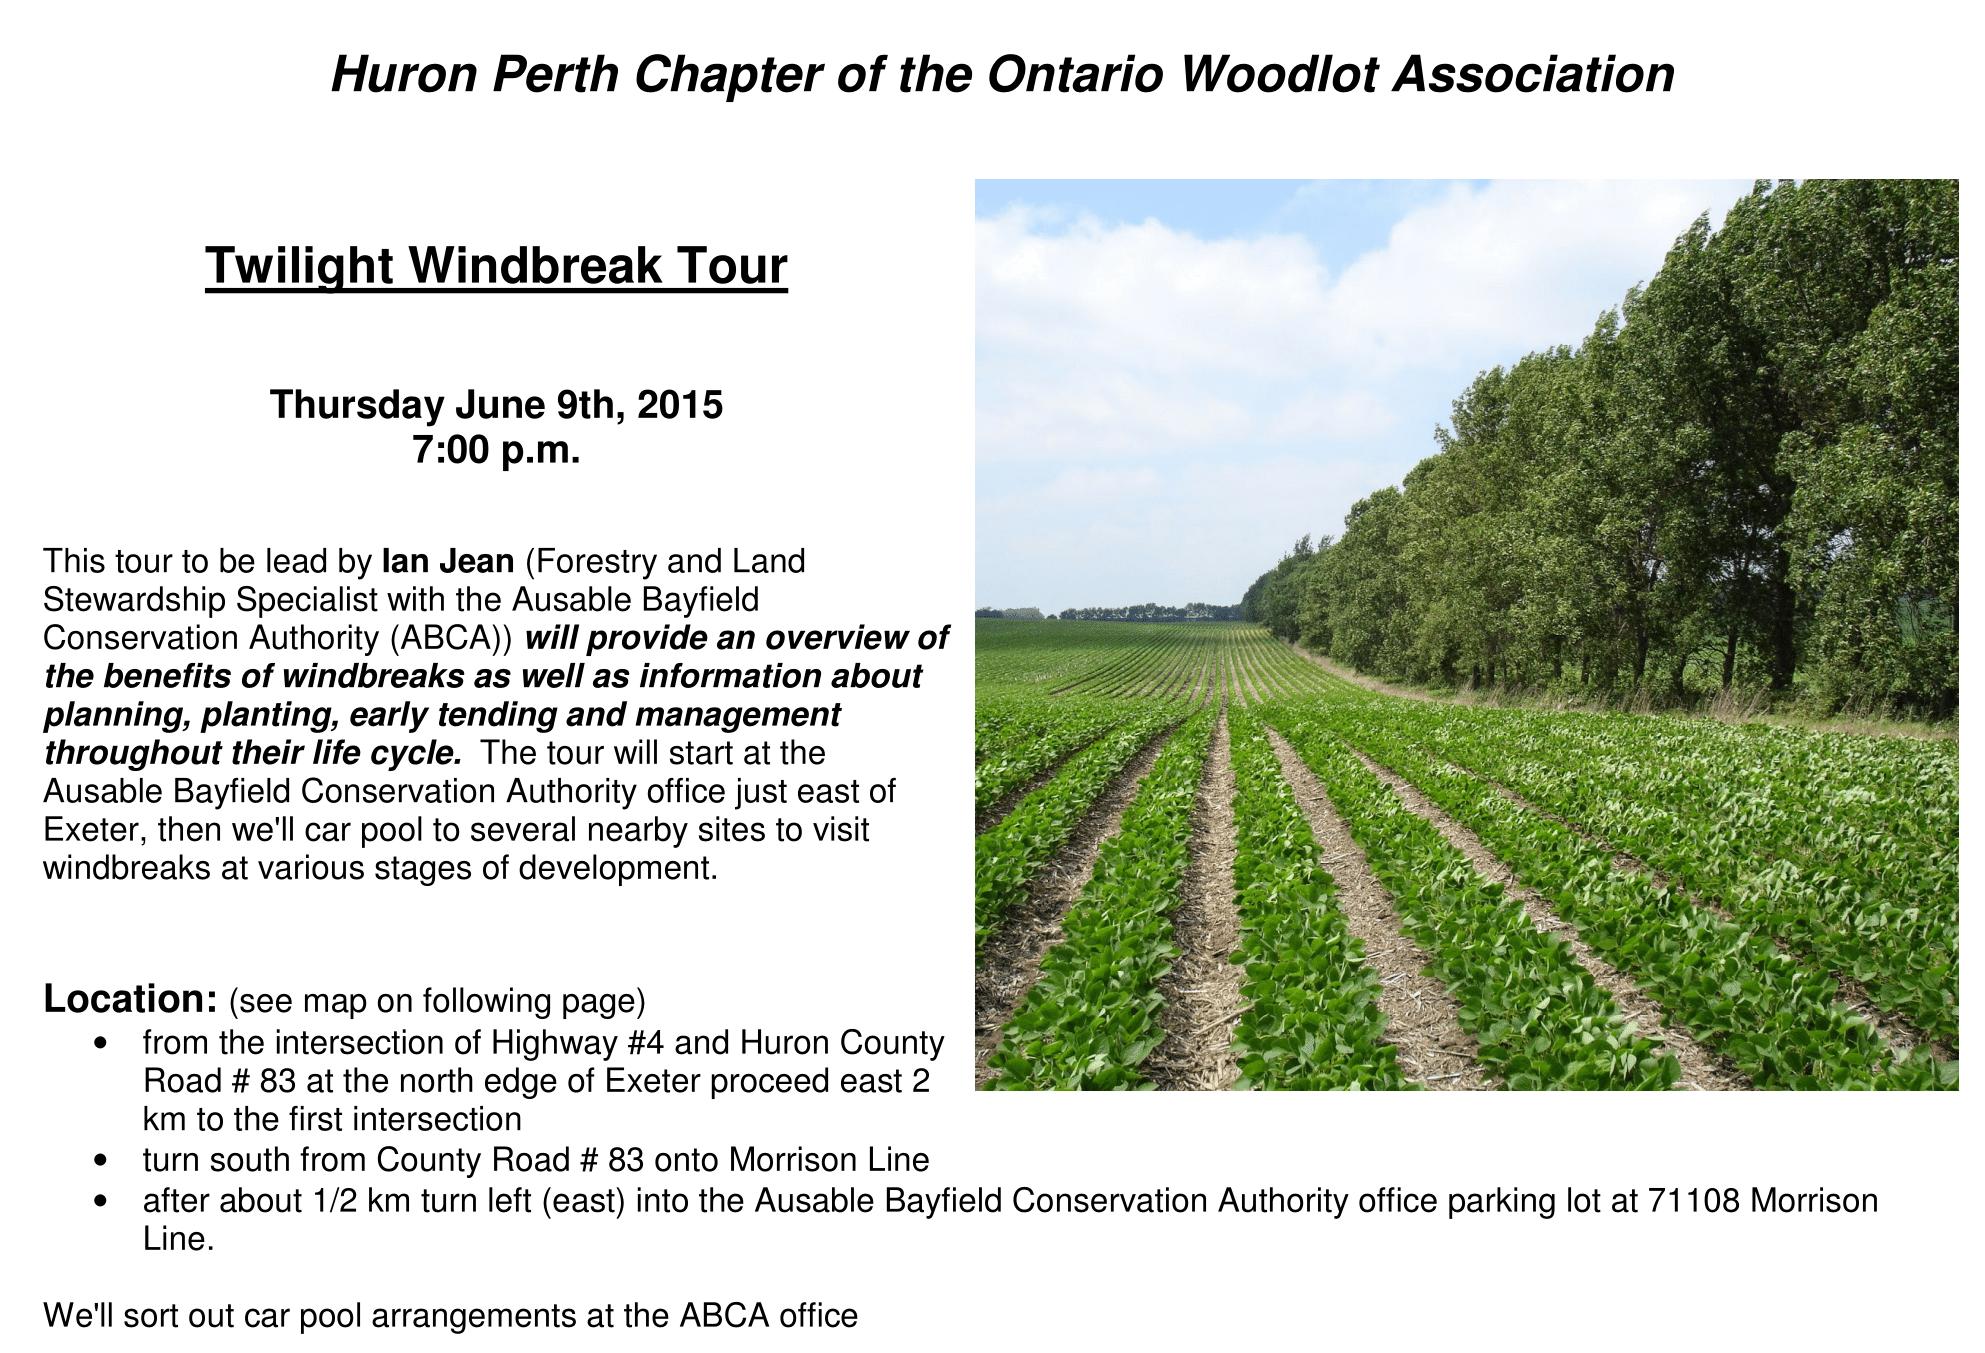 Windbreak Twilight Tour June 9, 2016-1